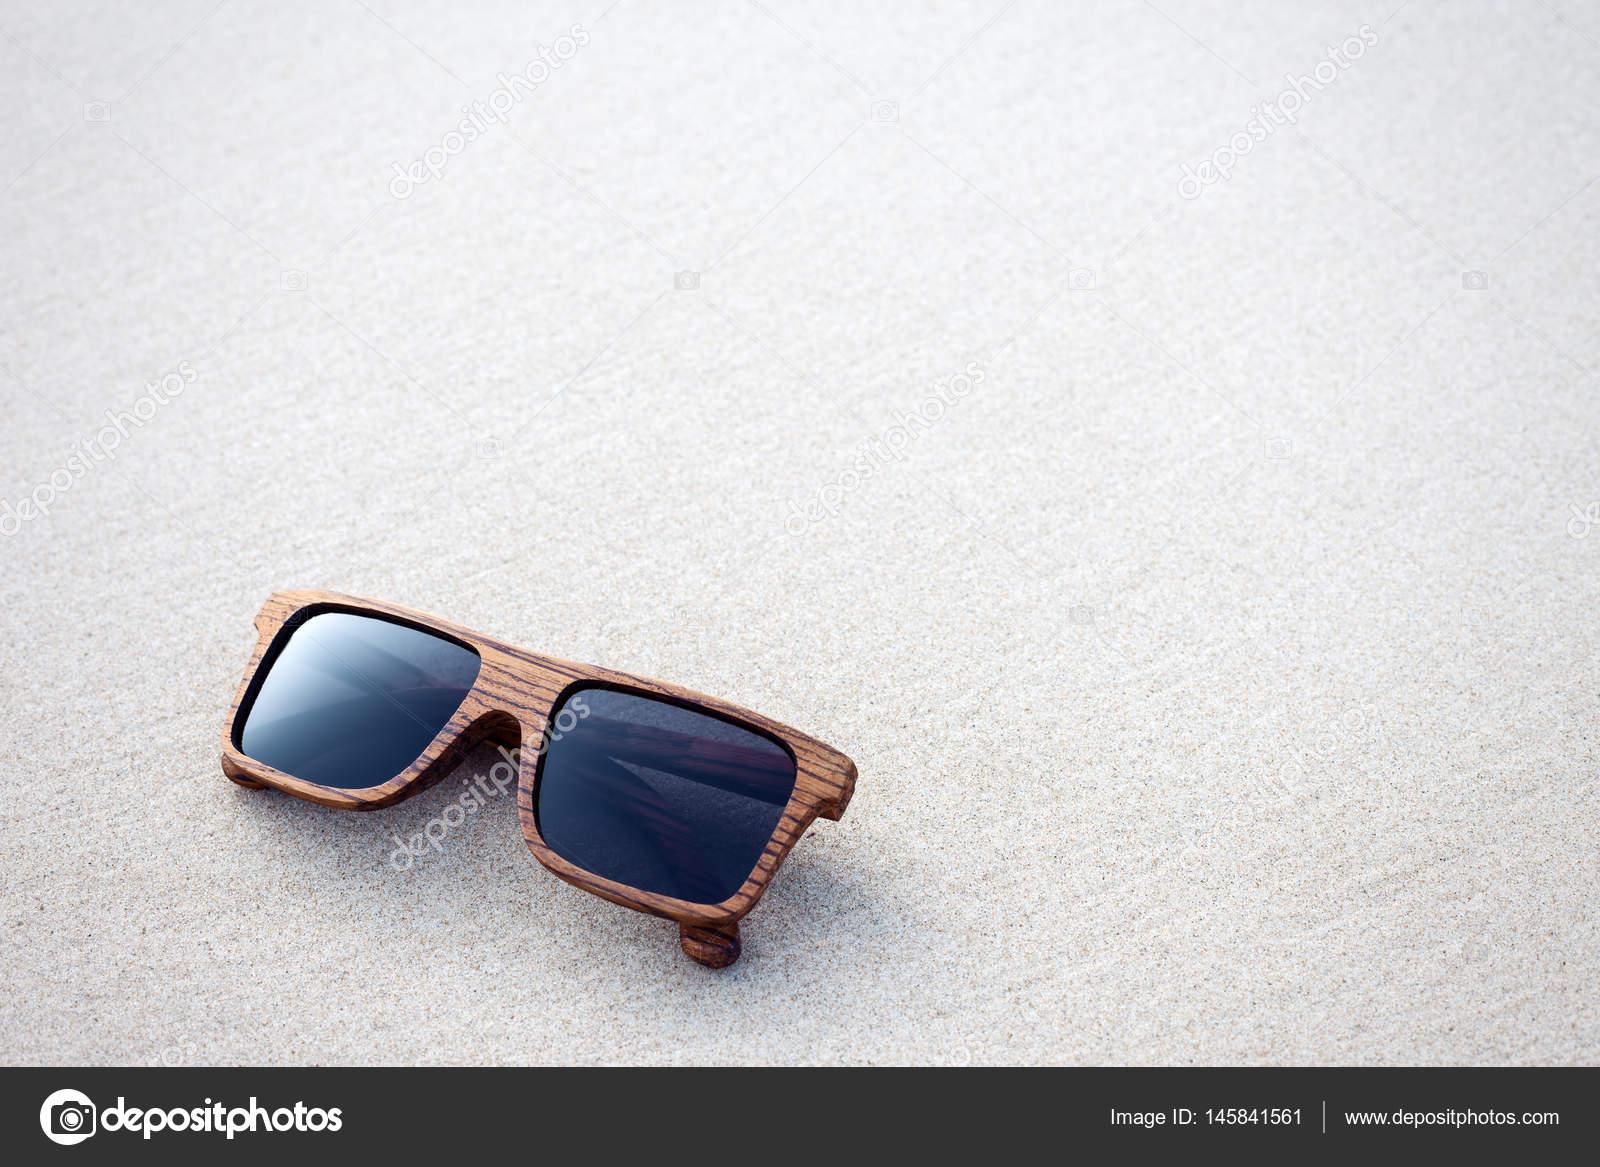 1f9daabb2d Ξύλινα γυαλιά ηλίου ξαπλωμένοι στην αμμουδιά — Φωτογραφία Αρχείου ...